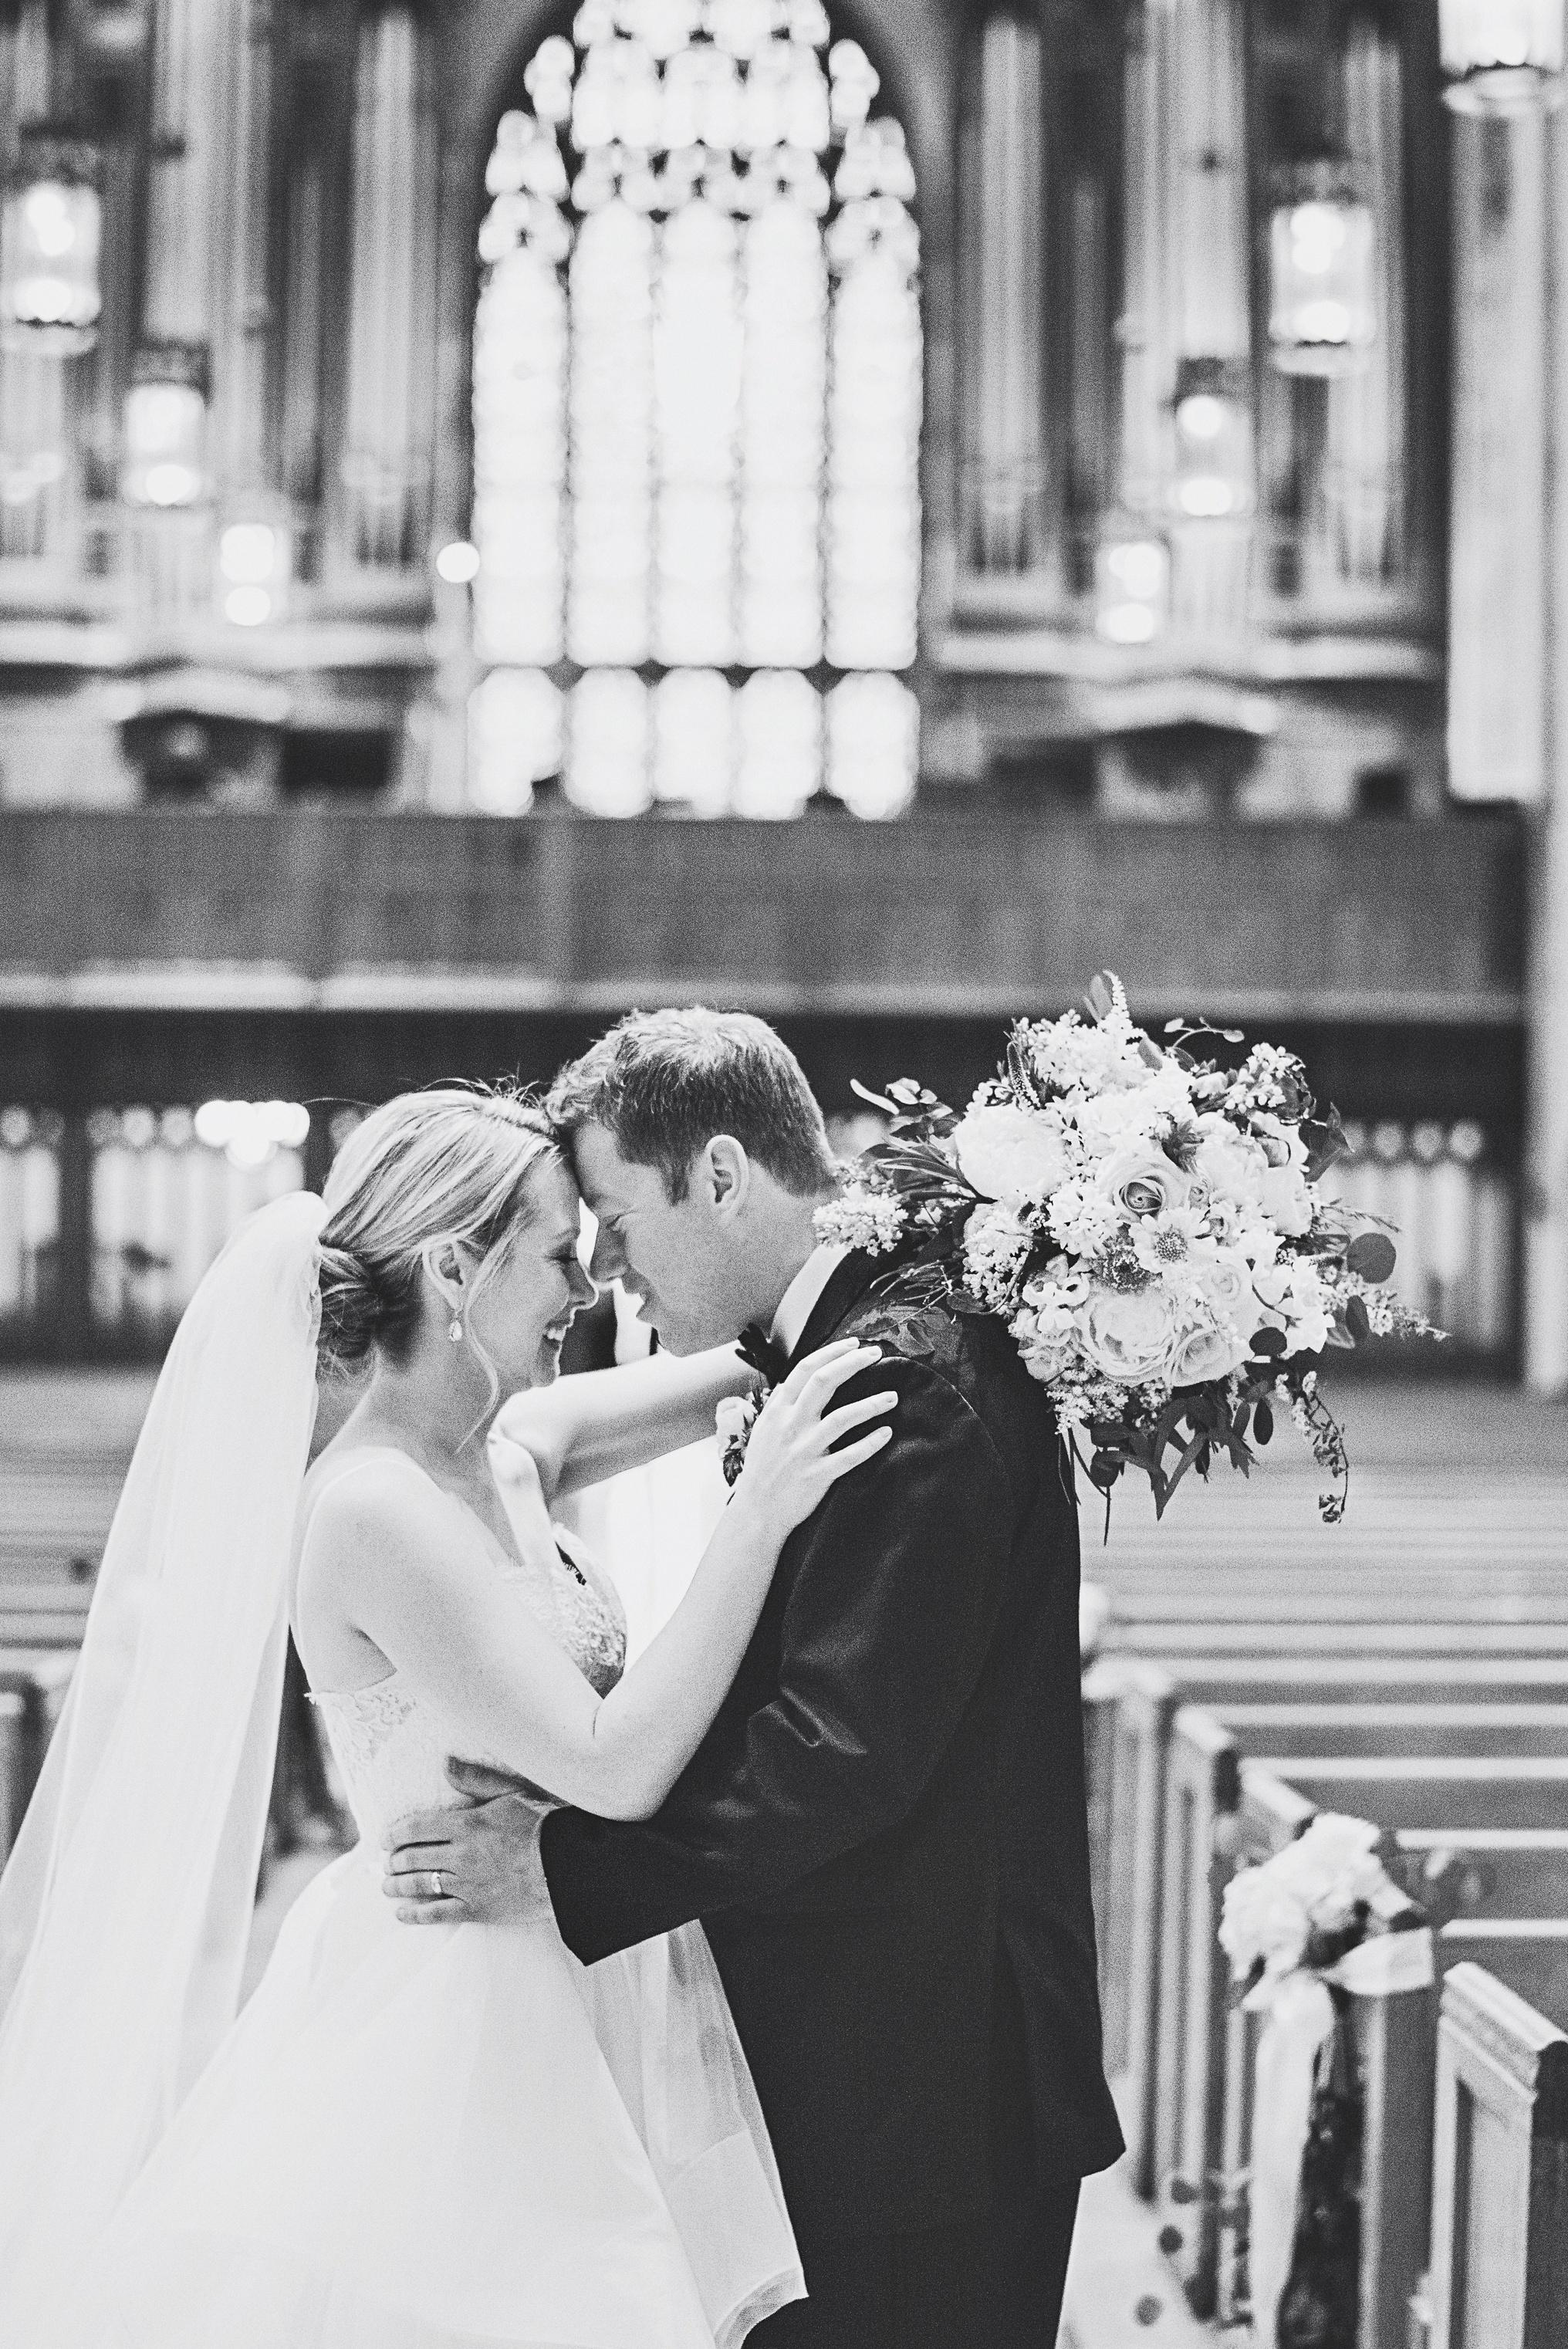 best_wedding_photography_2017_by_lucas_botz_photography_109.jpg